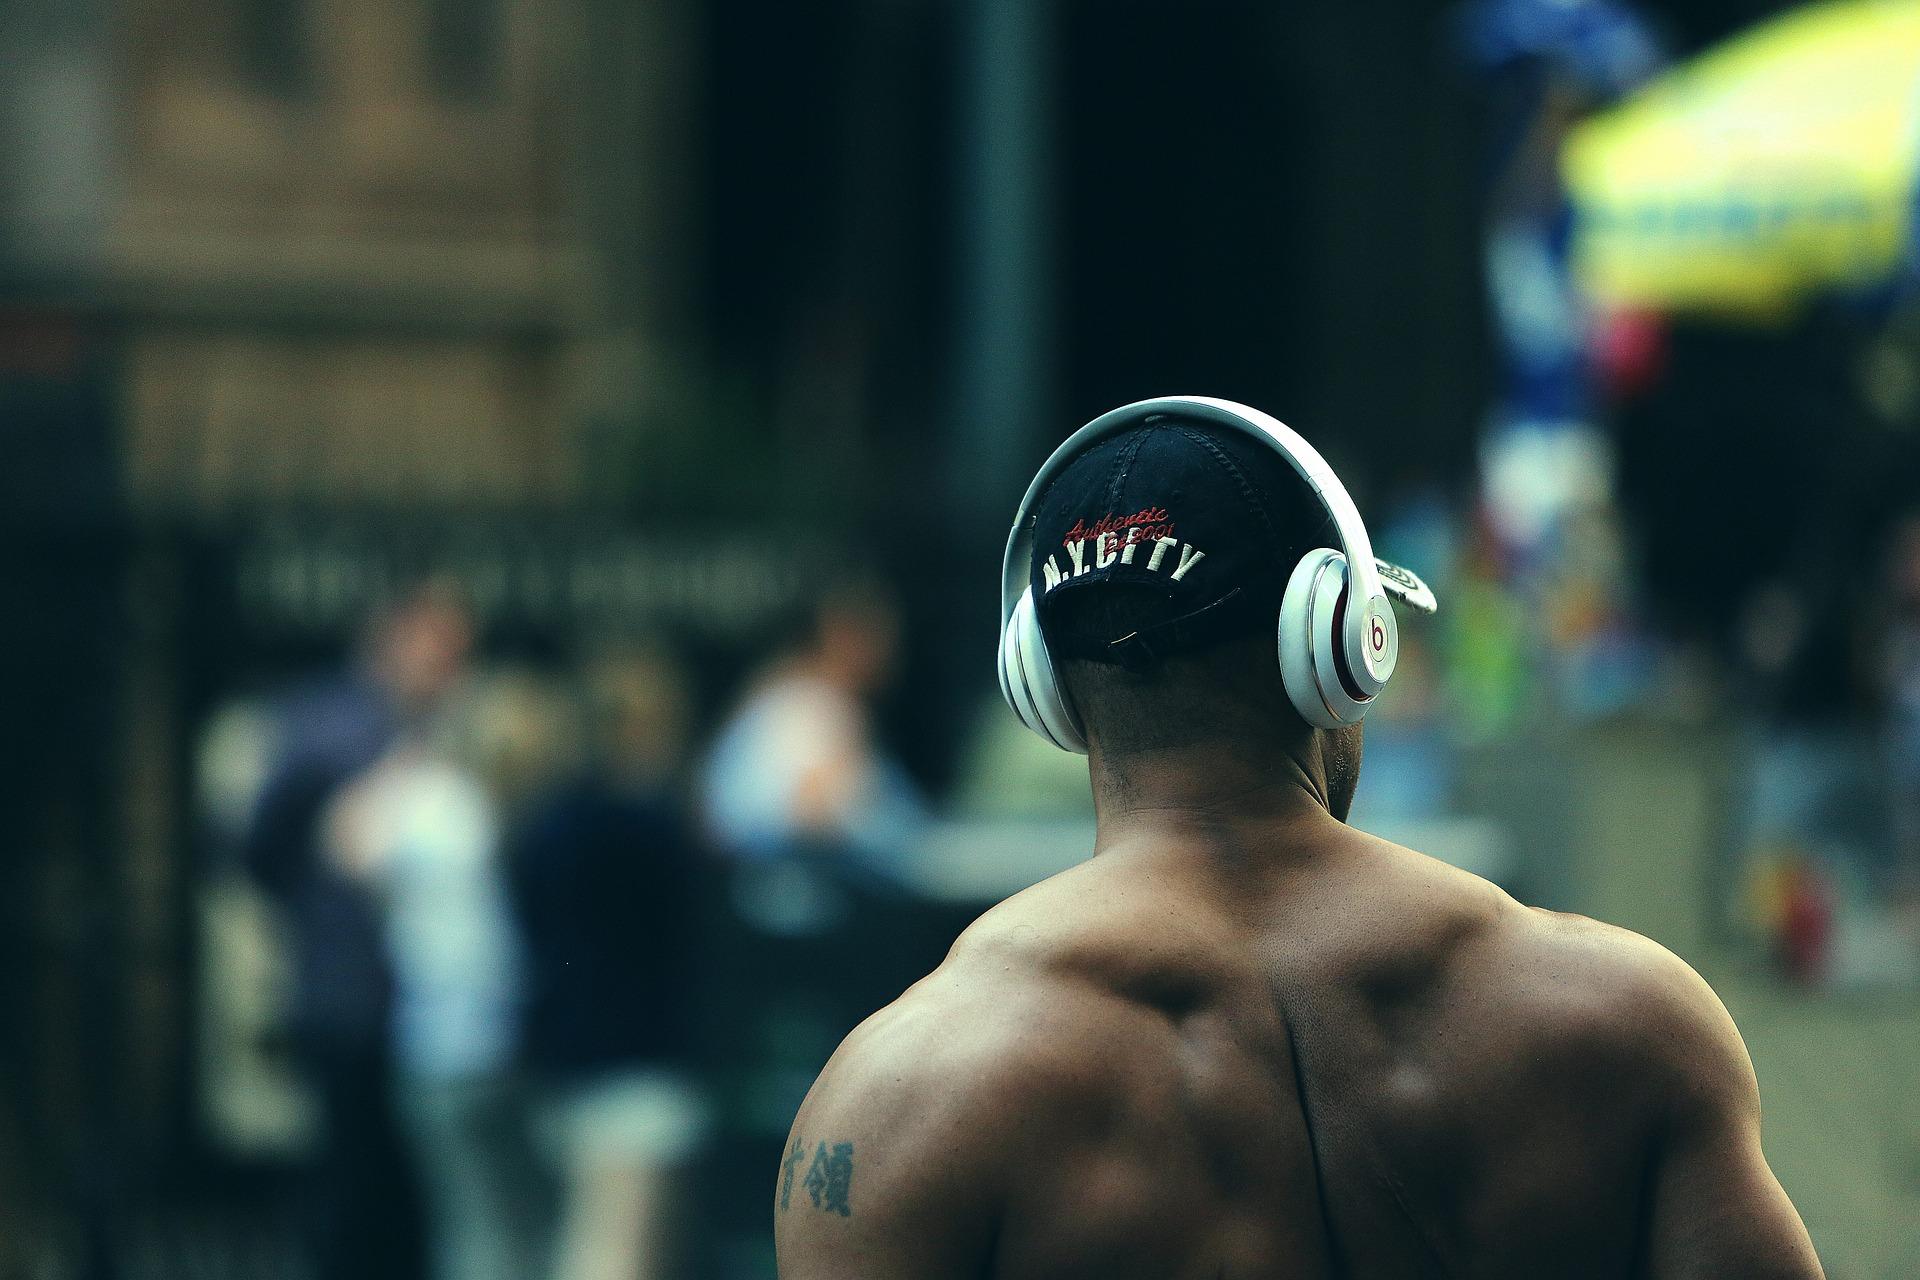 https://s3.us-east-2.amazonaws.com/withjamesbarr/genres/workout-headphones.jpg